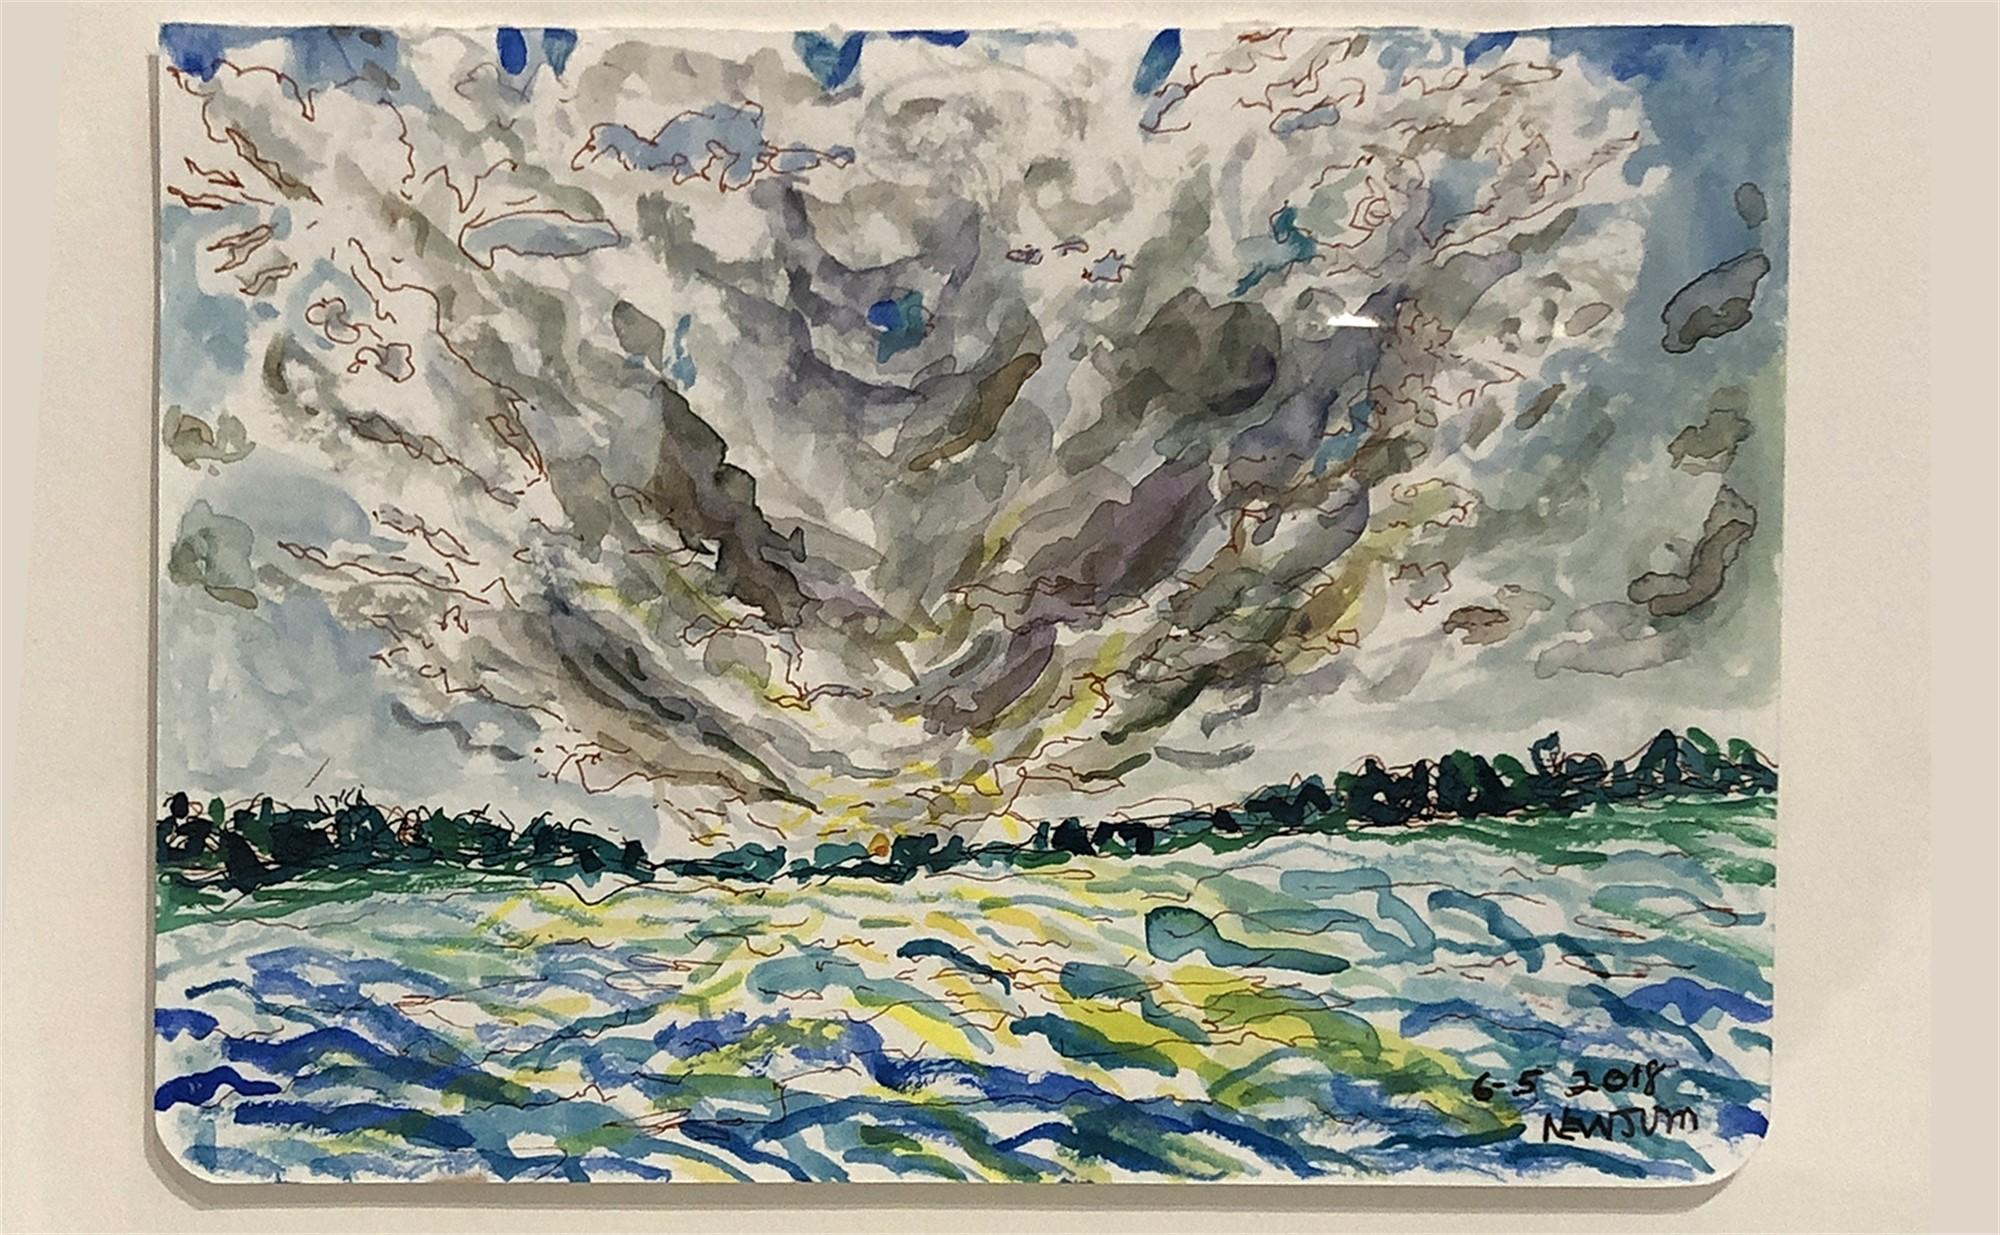 Storm Approaching III by Floyd Newsum